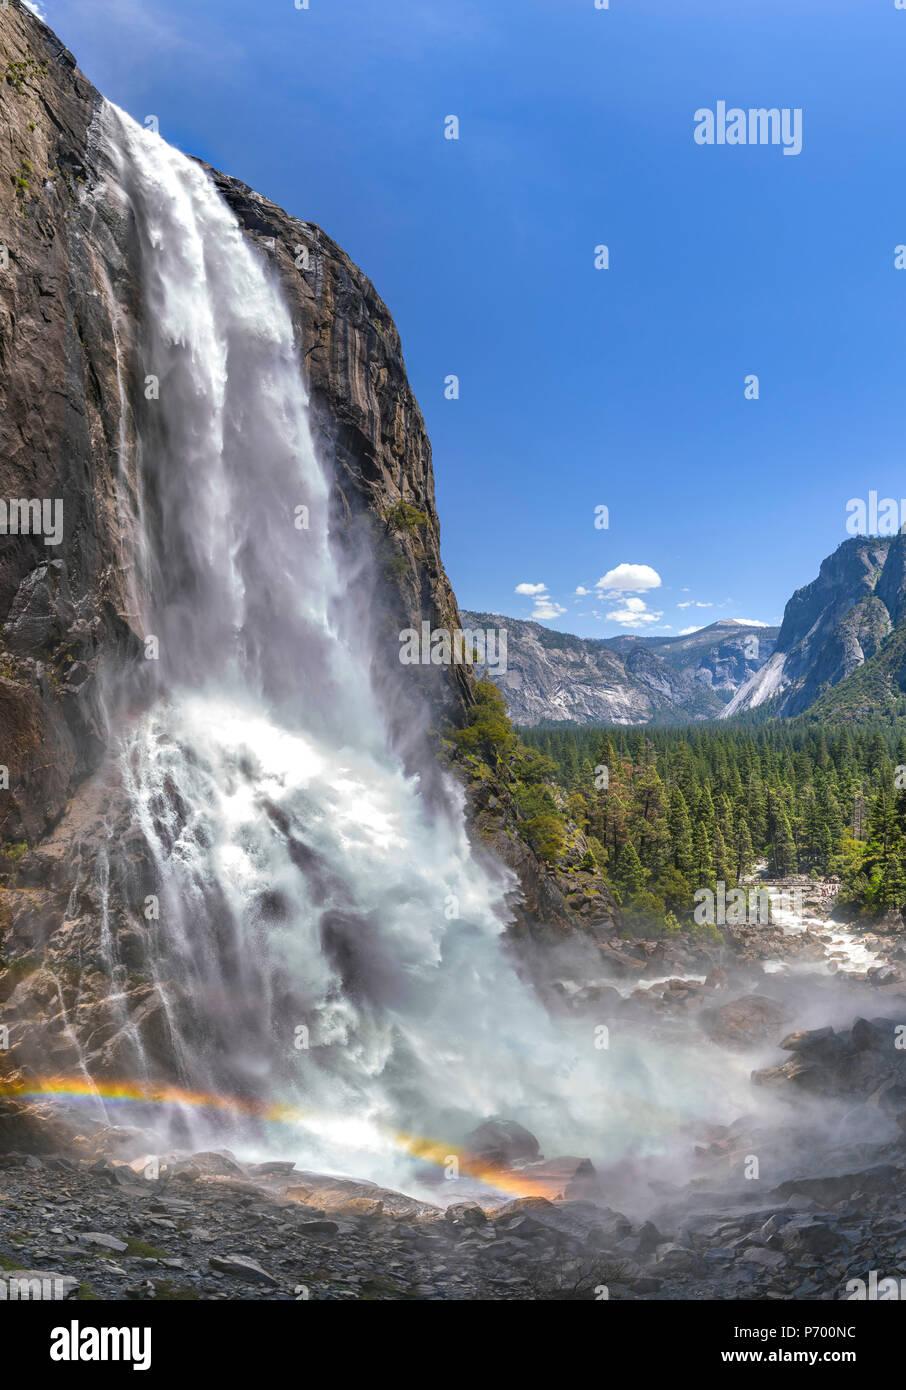 Unteren Yosemite Falls vertikale Panorama Stockbild